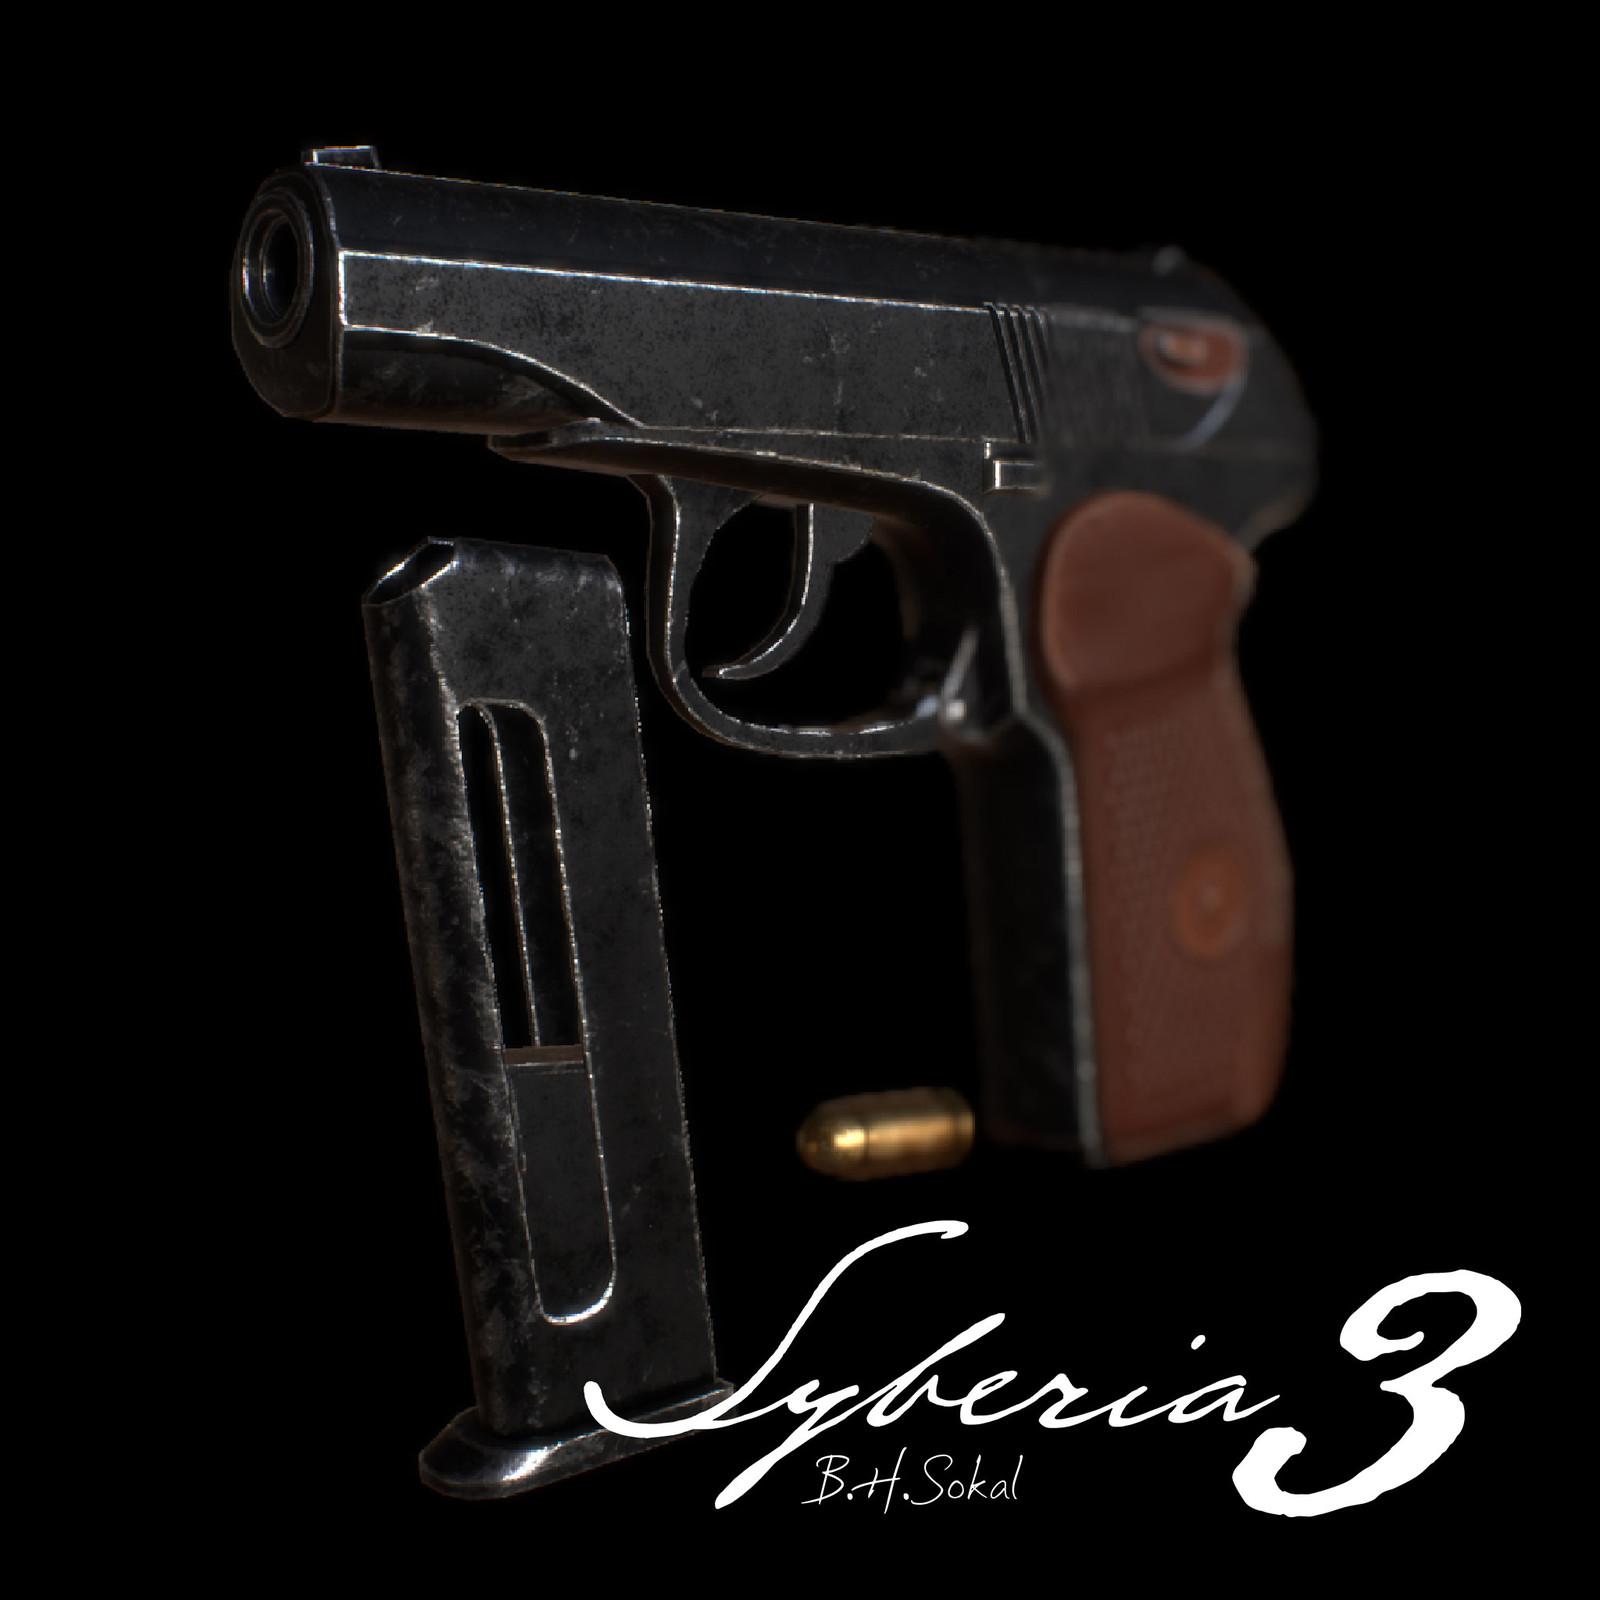 Syberia 3: Gun Makarov